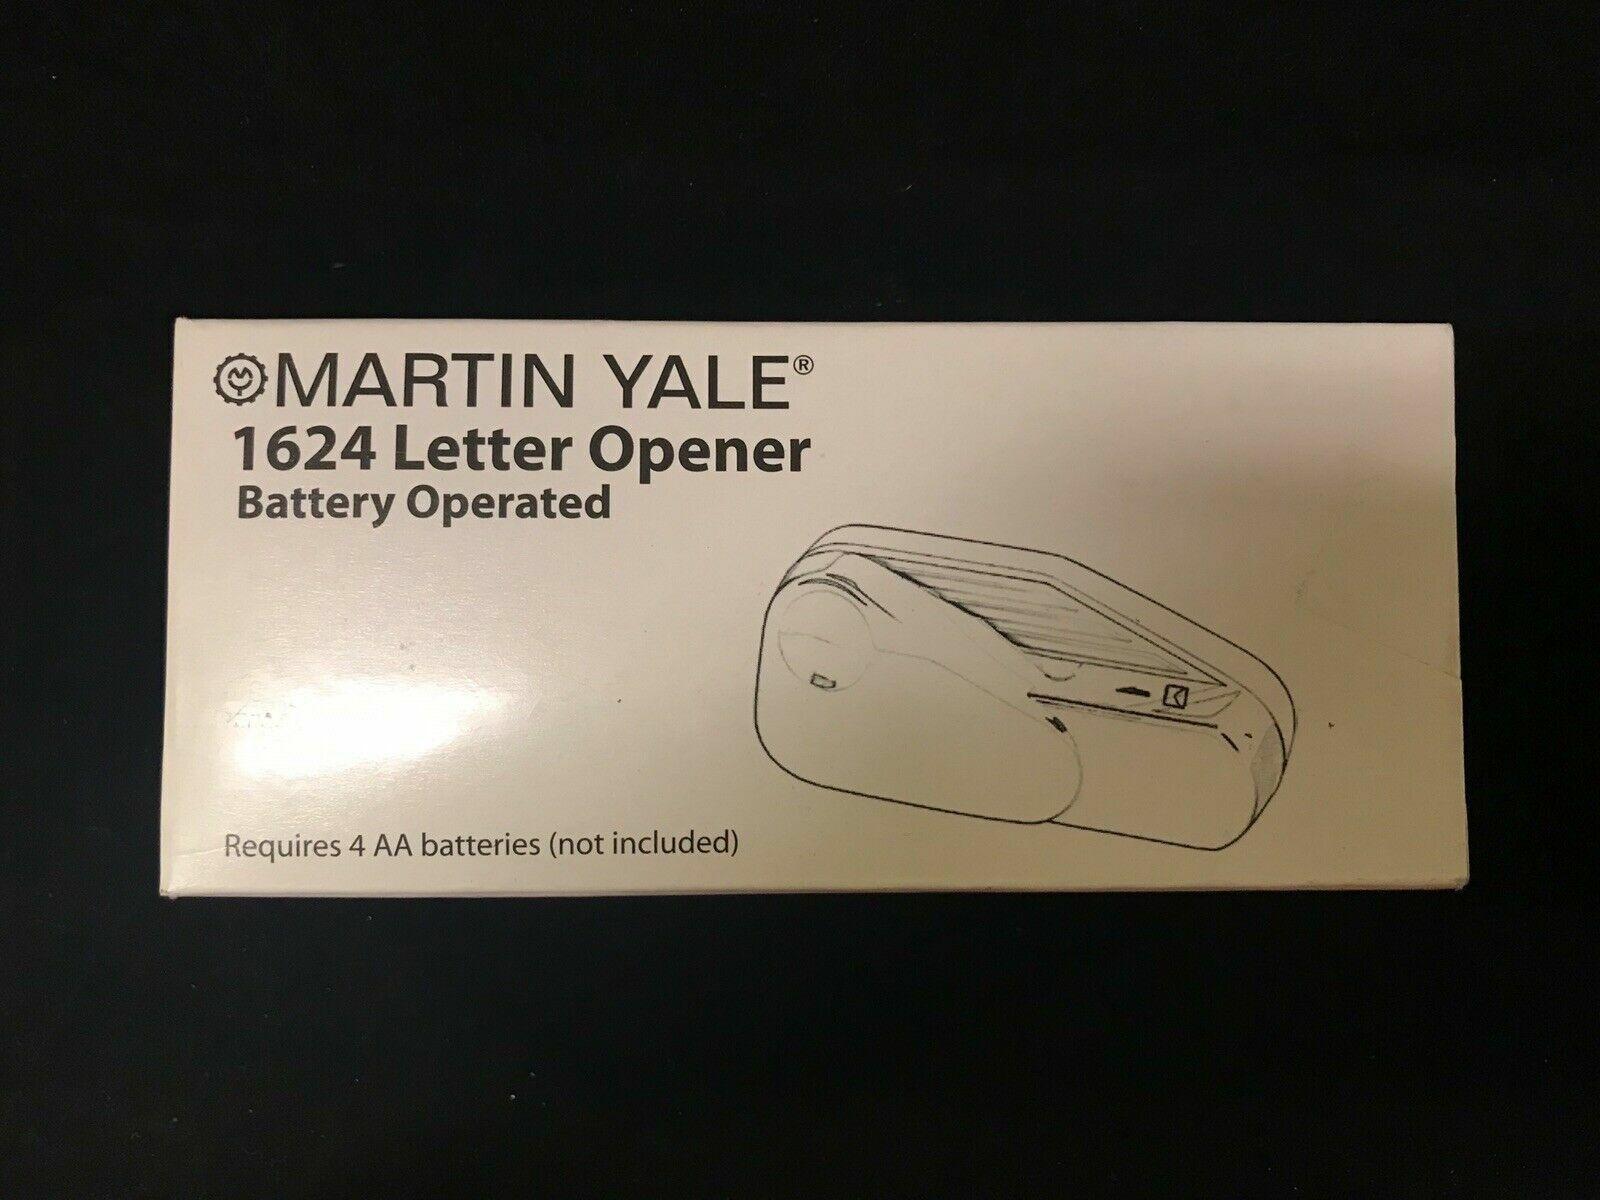 Martin Yale Model 1624 Handheld Battery Operated Letter Opener Black